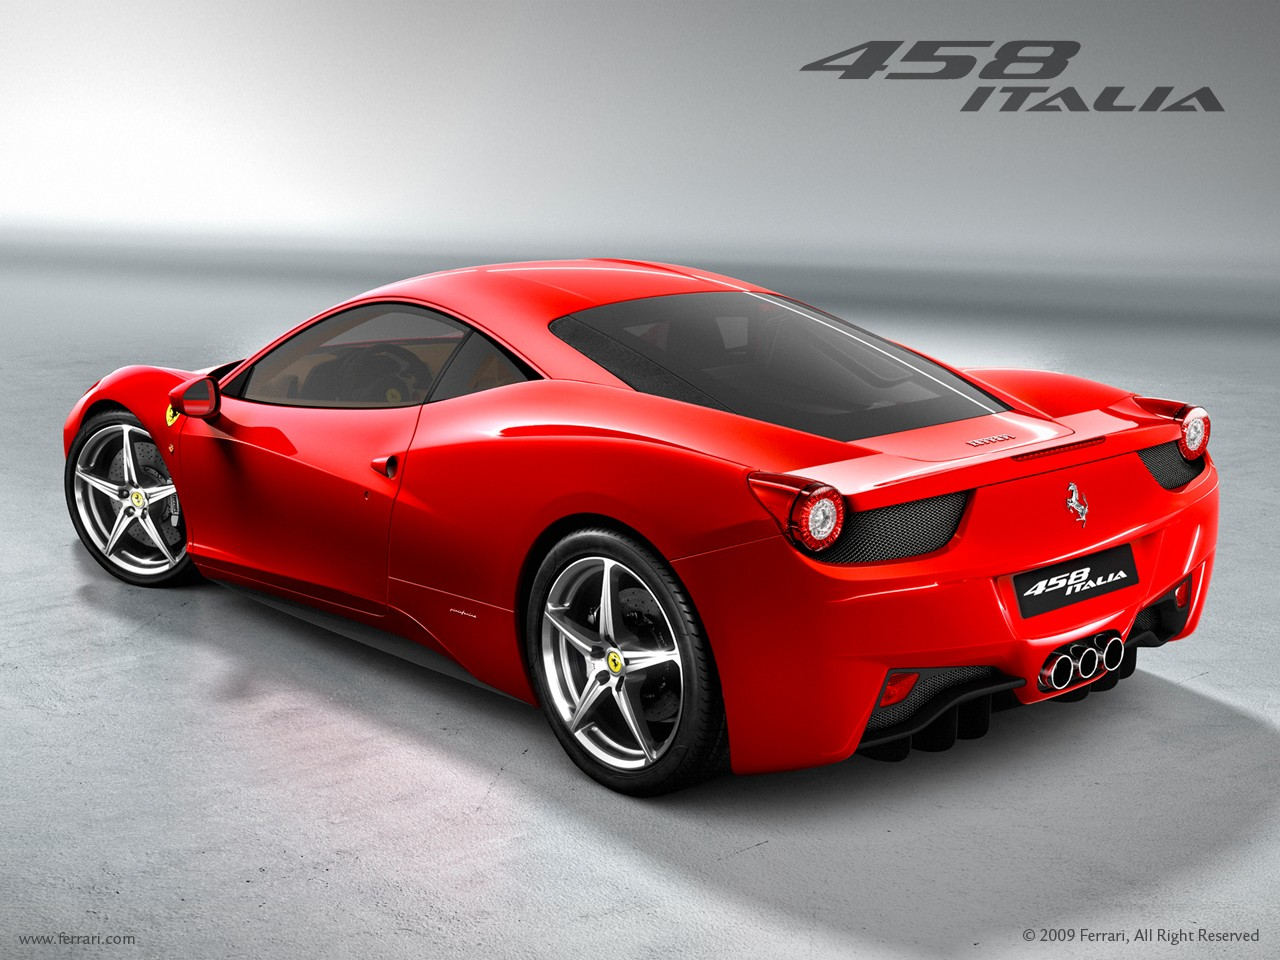 Un 4x4 se gare sur une Ferrari 458 Italia  Vid  o  Quand deux voitures oD73oHqg